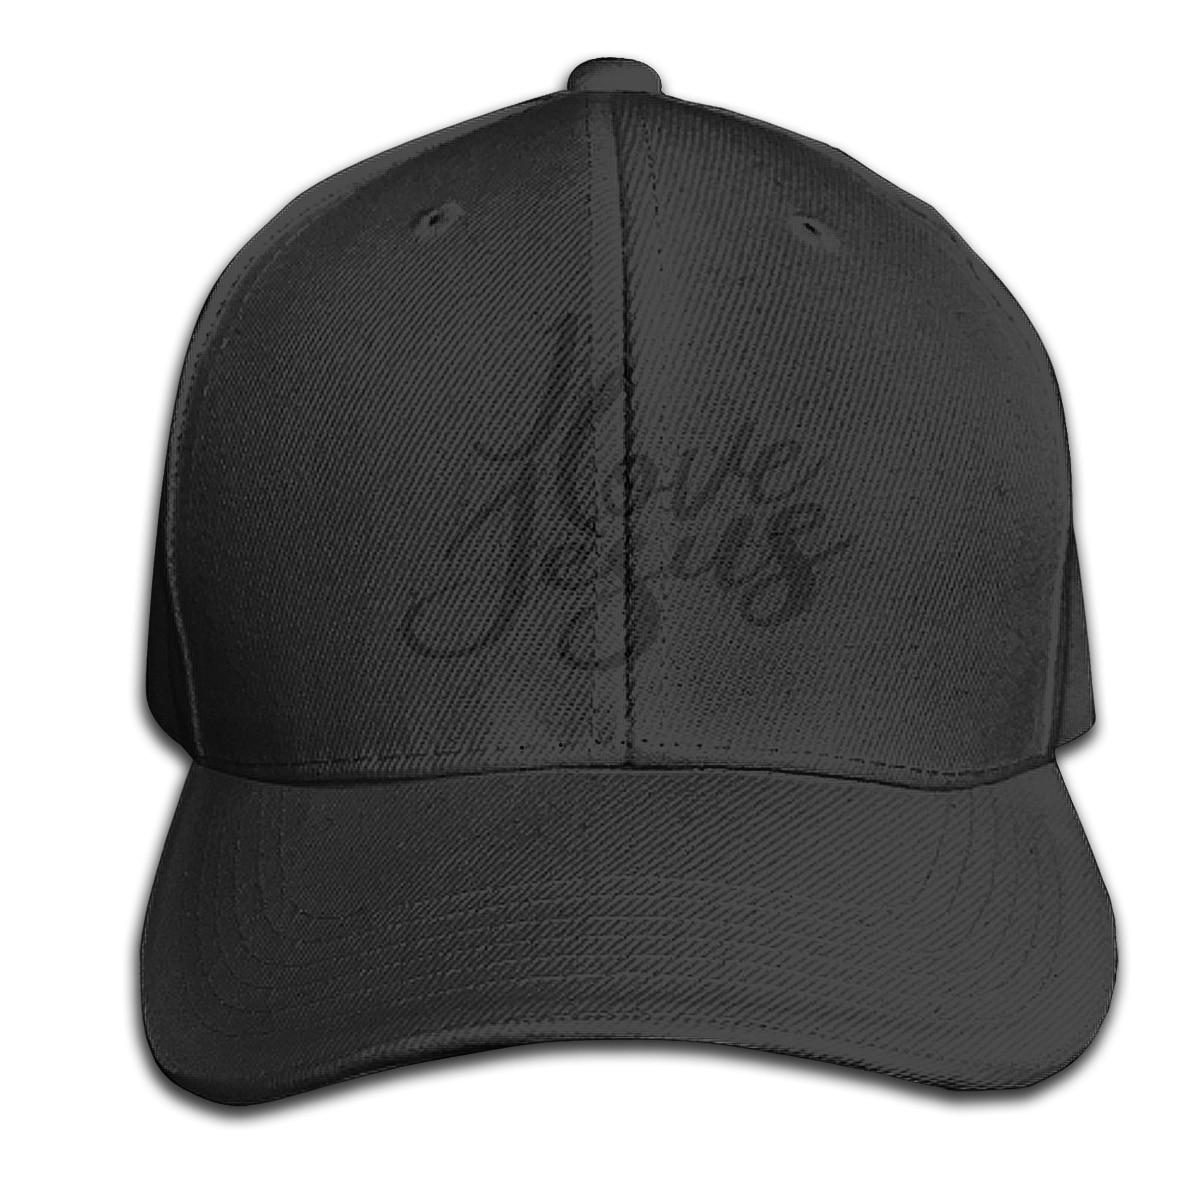 Бейсболка I LOVE jesu 476 Кепка с козырьком Мужская кепка женская мужская Кепка Козырек женская мужская Кепка летняя женская кепка